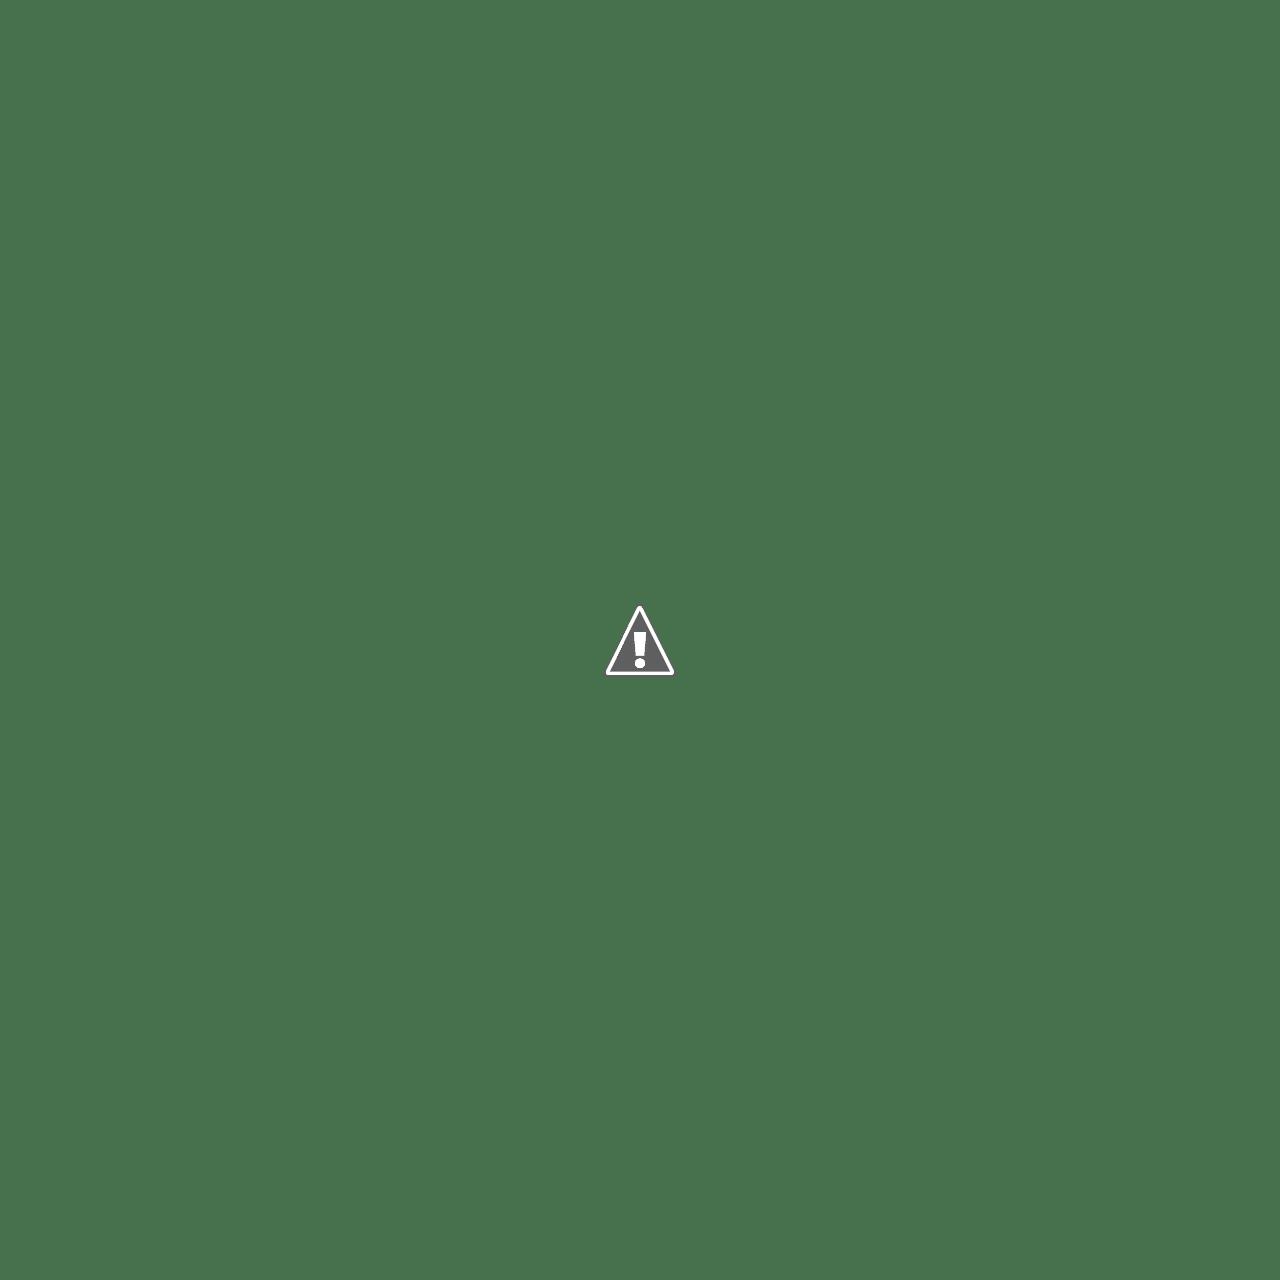 ALBATROSS - Κατάστημα παιδικών ενδυμάτων στην τοποθεσία Αμπελόκηποι ... 3bc7605780a